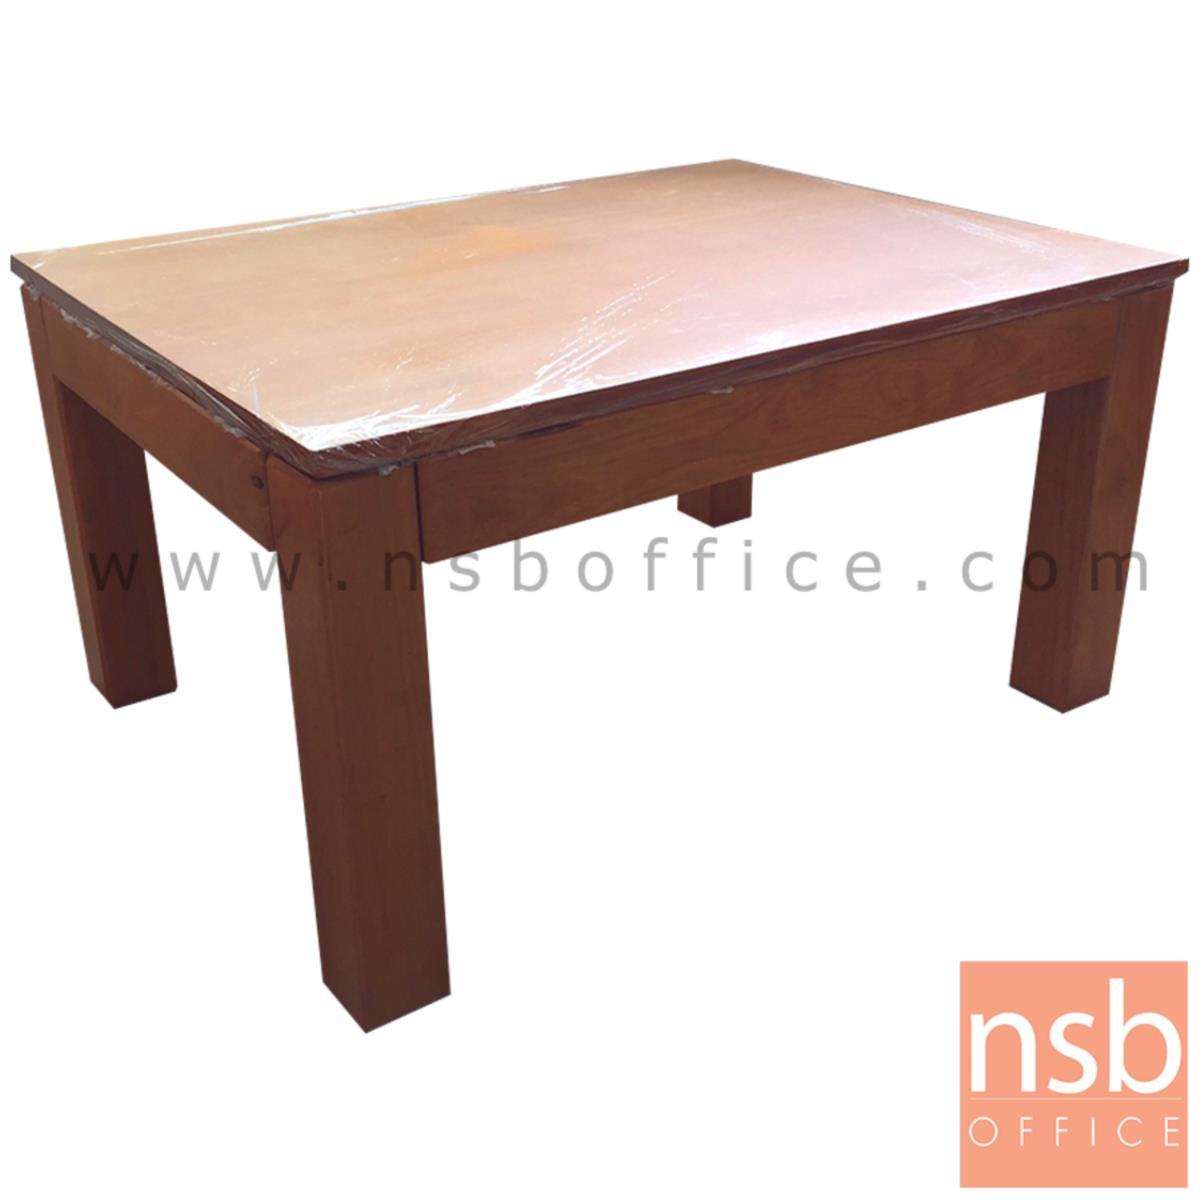 L10A126:โต๊ะกลางไม้  ขนาด 80W*42.5H cm.